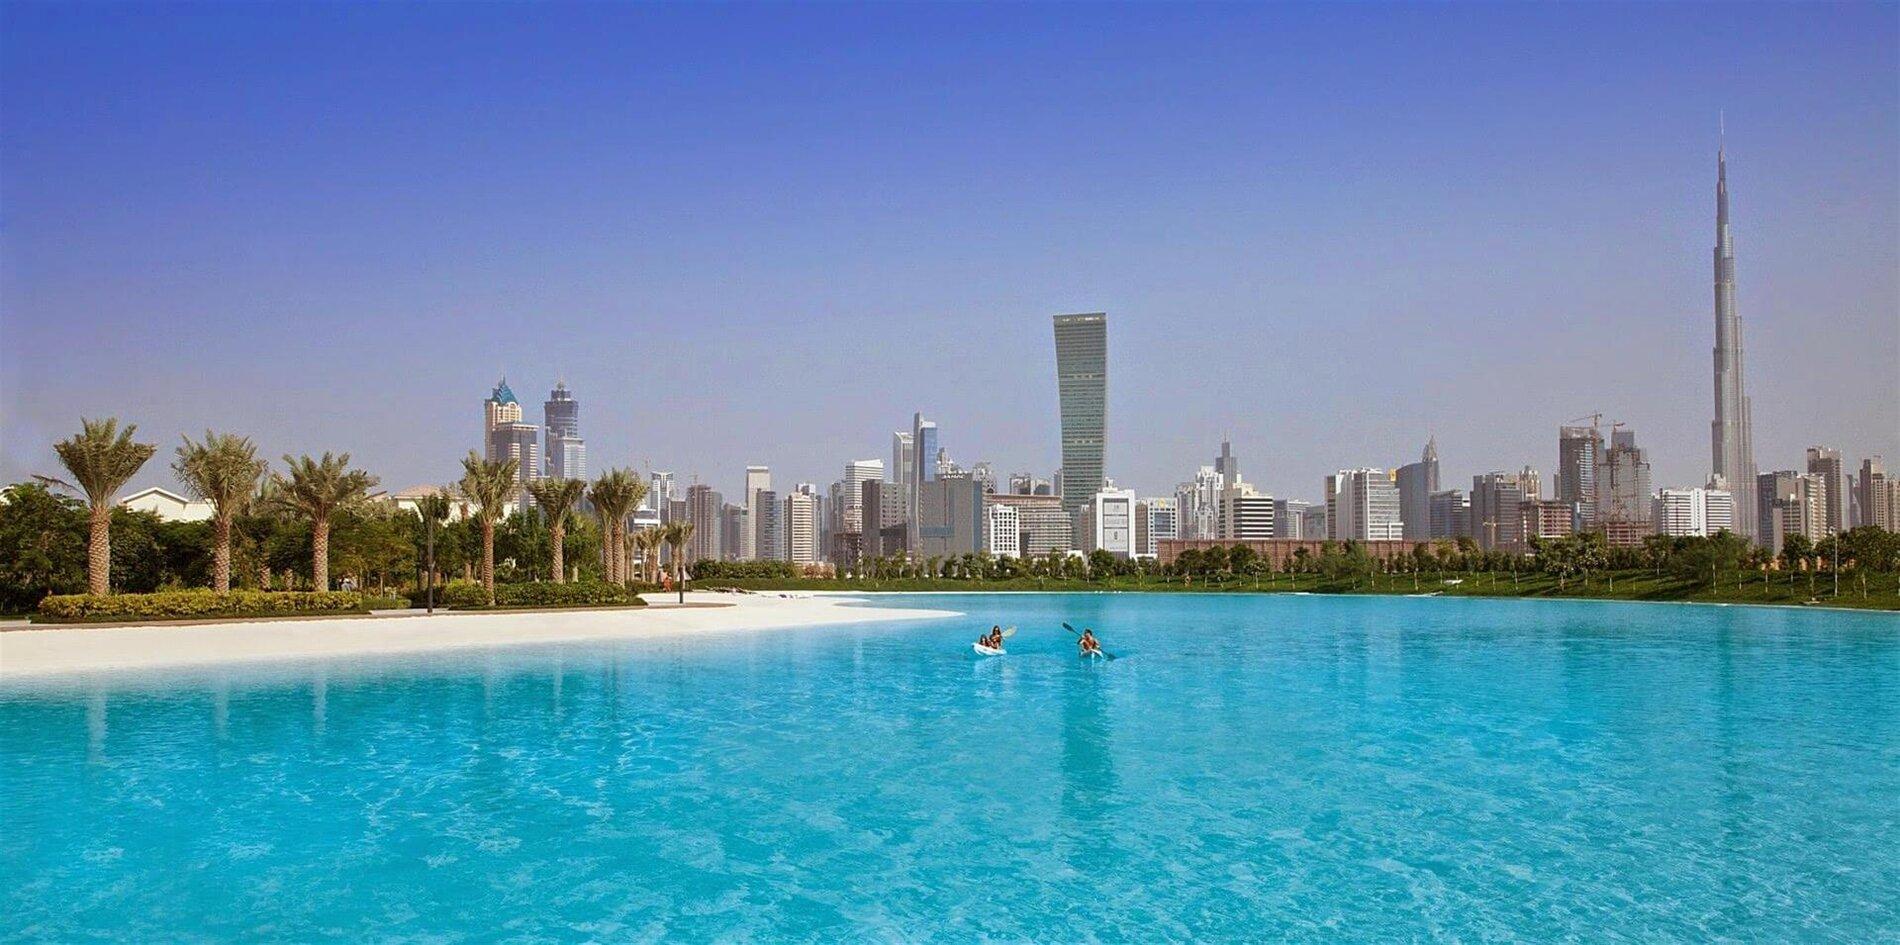 Kantoor Dubai